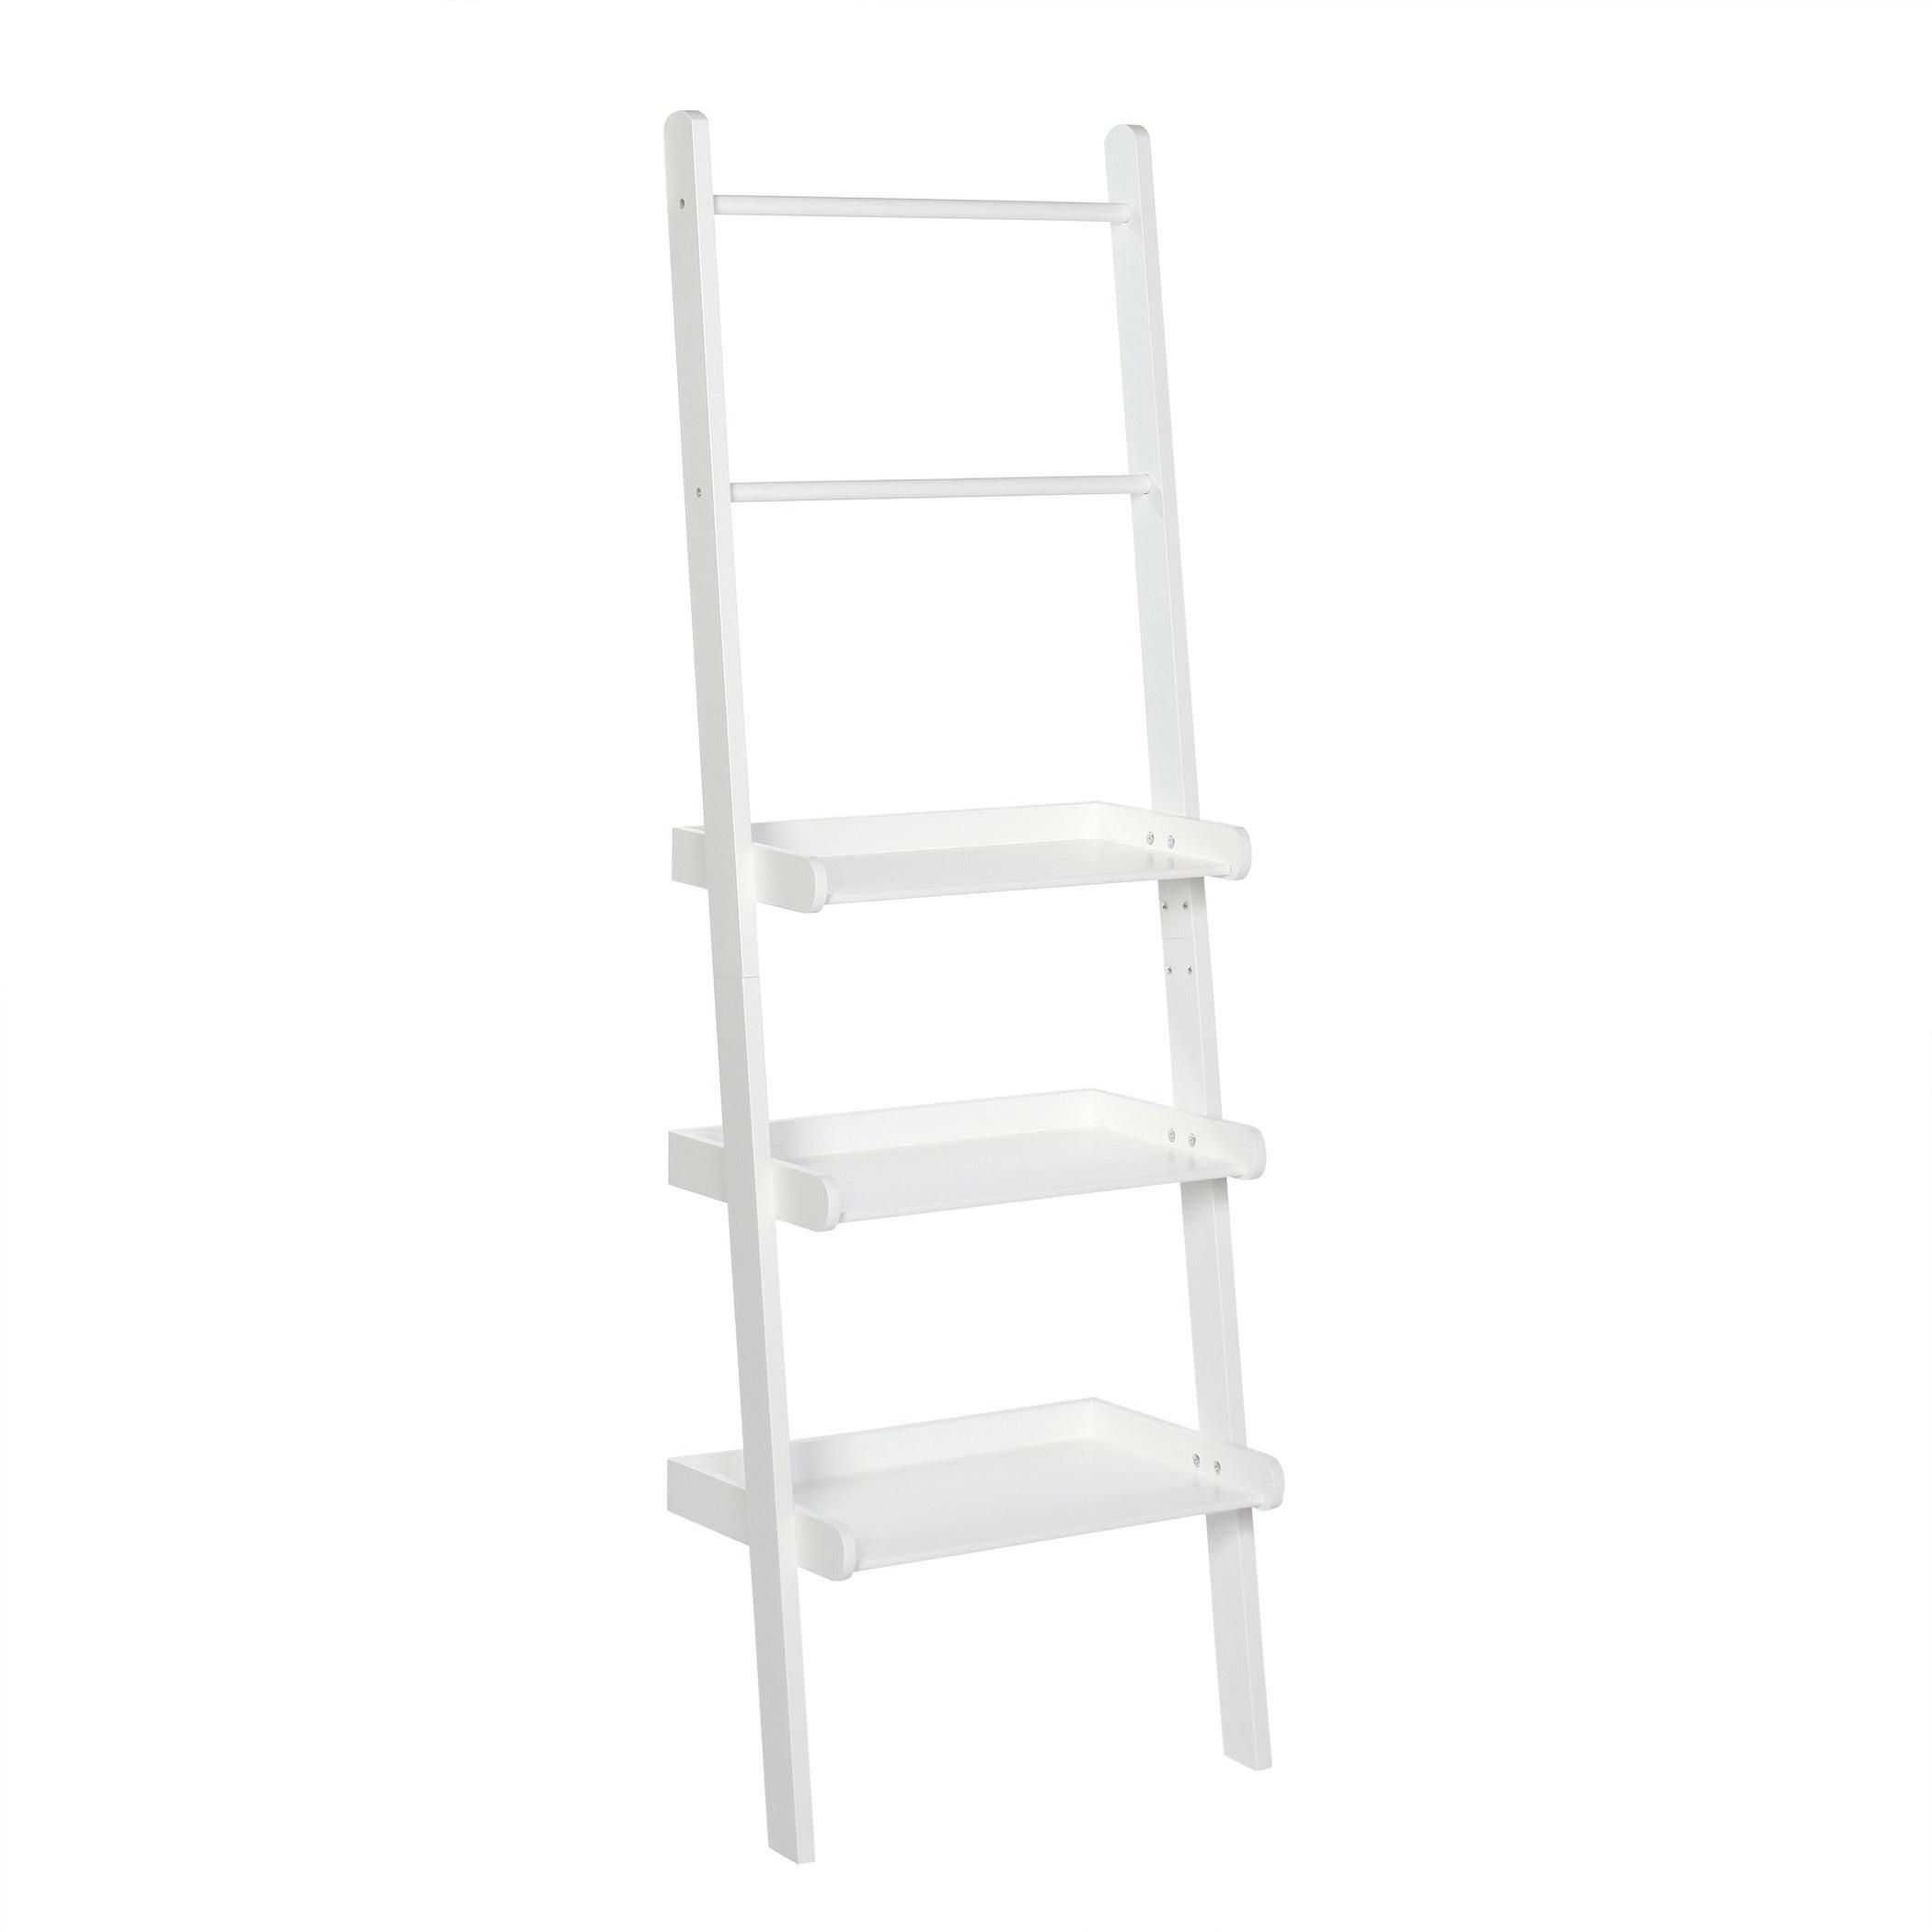 Shop RiverRidge Home Ladder Shelf with Towel Bars - Free Shipping ...